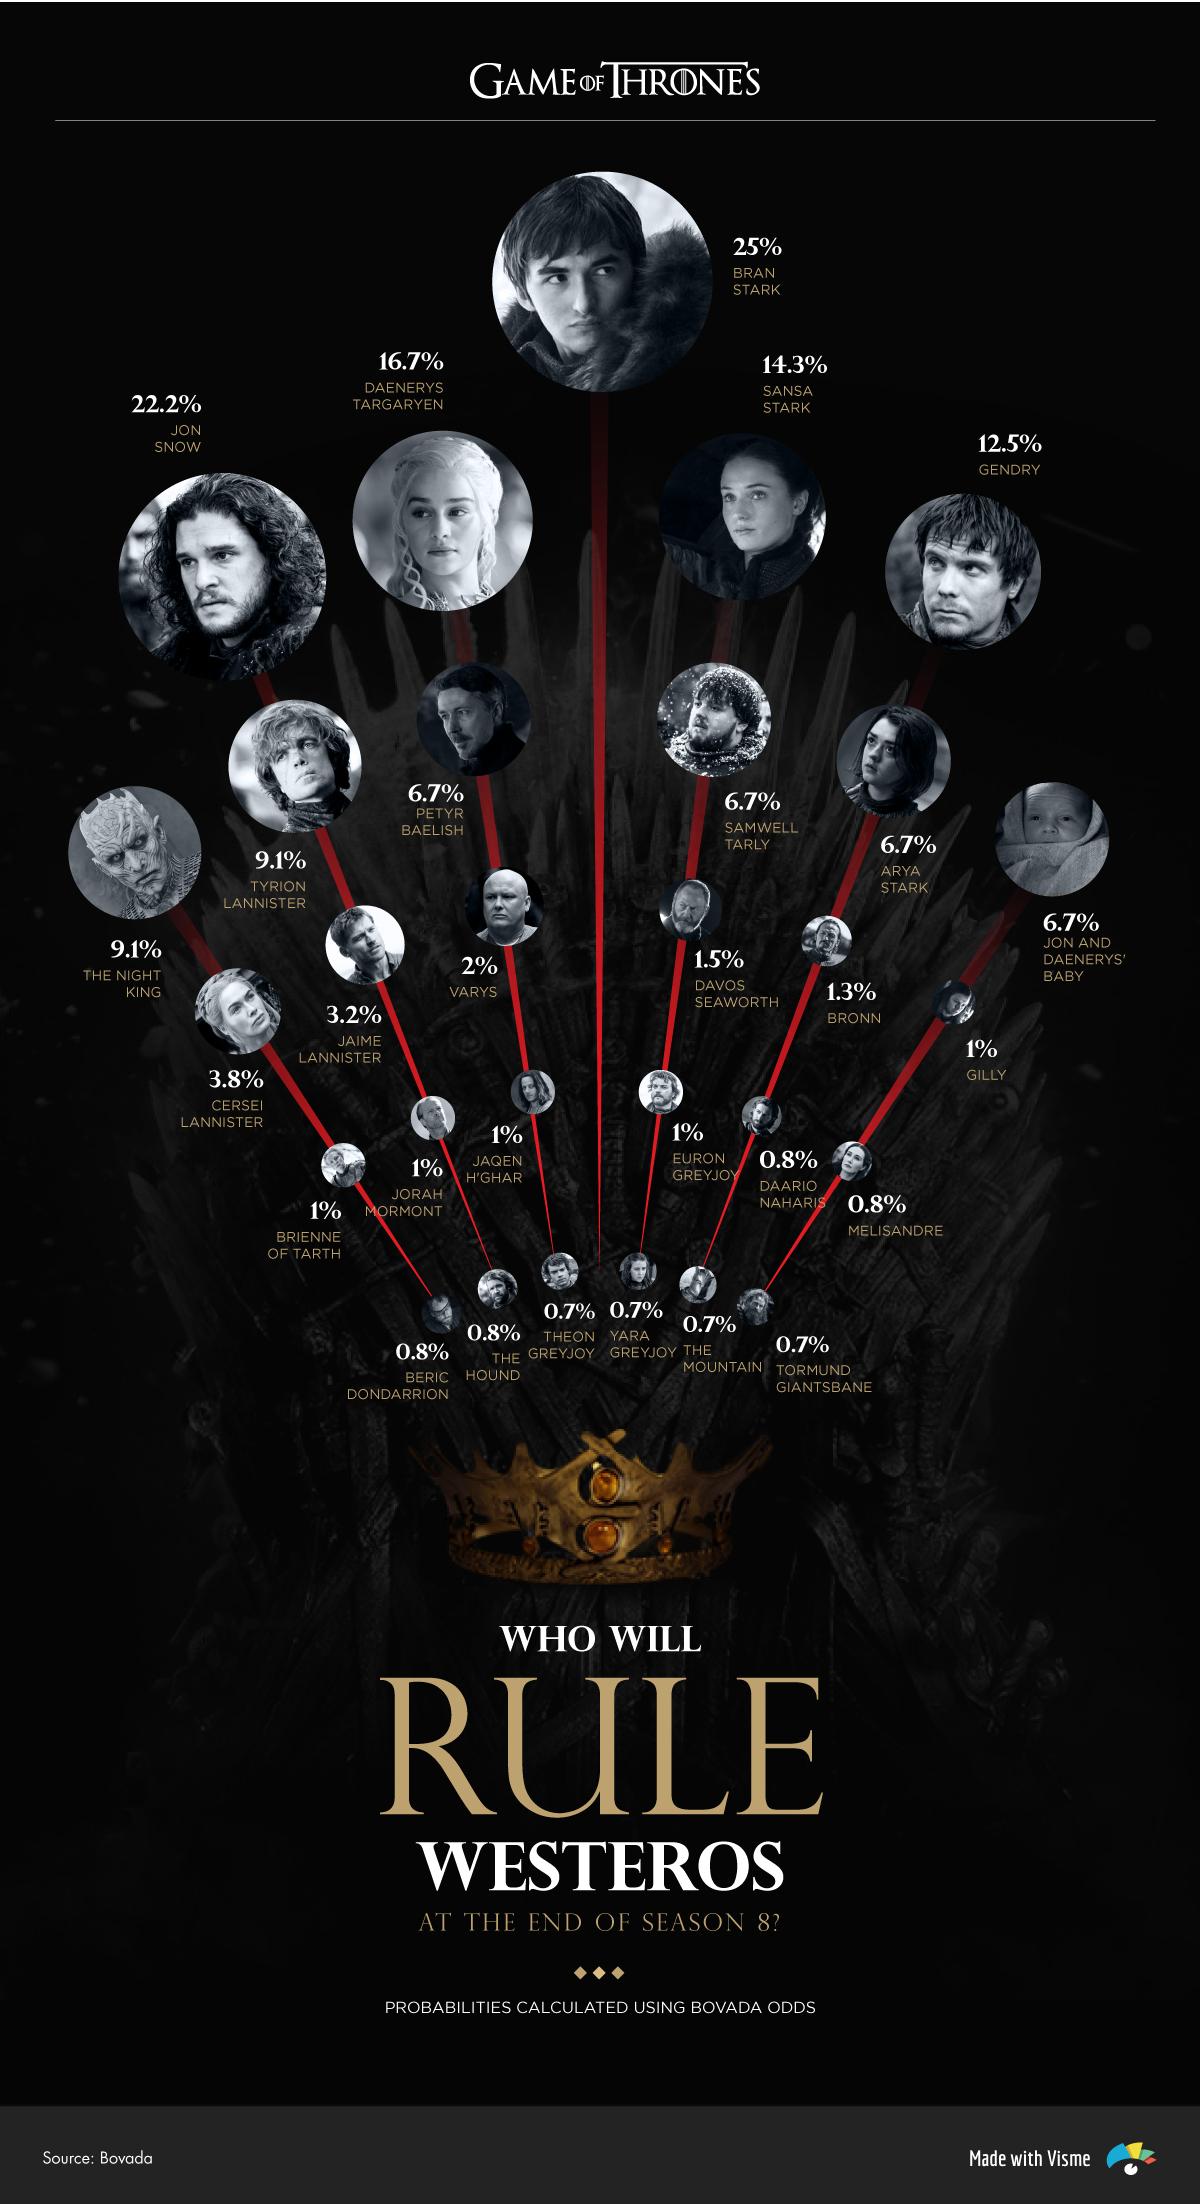 Place game Of thrones characters season 1 Trailer imdb